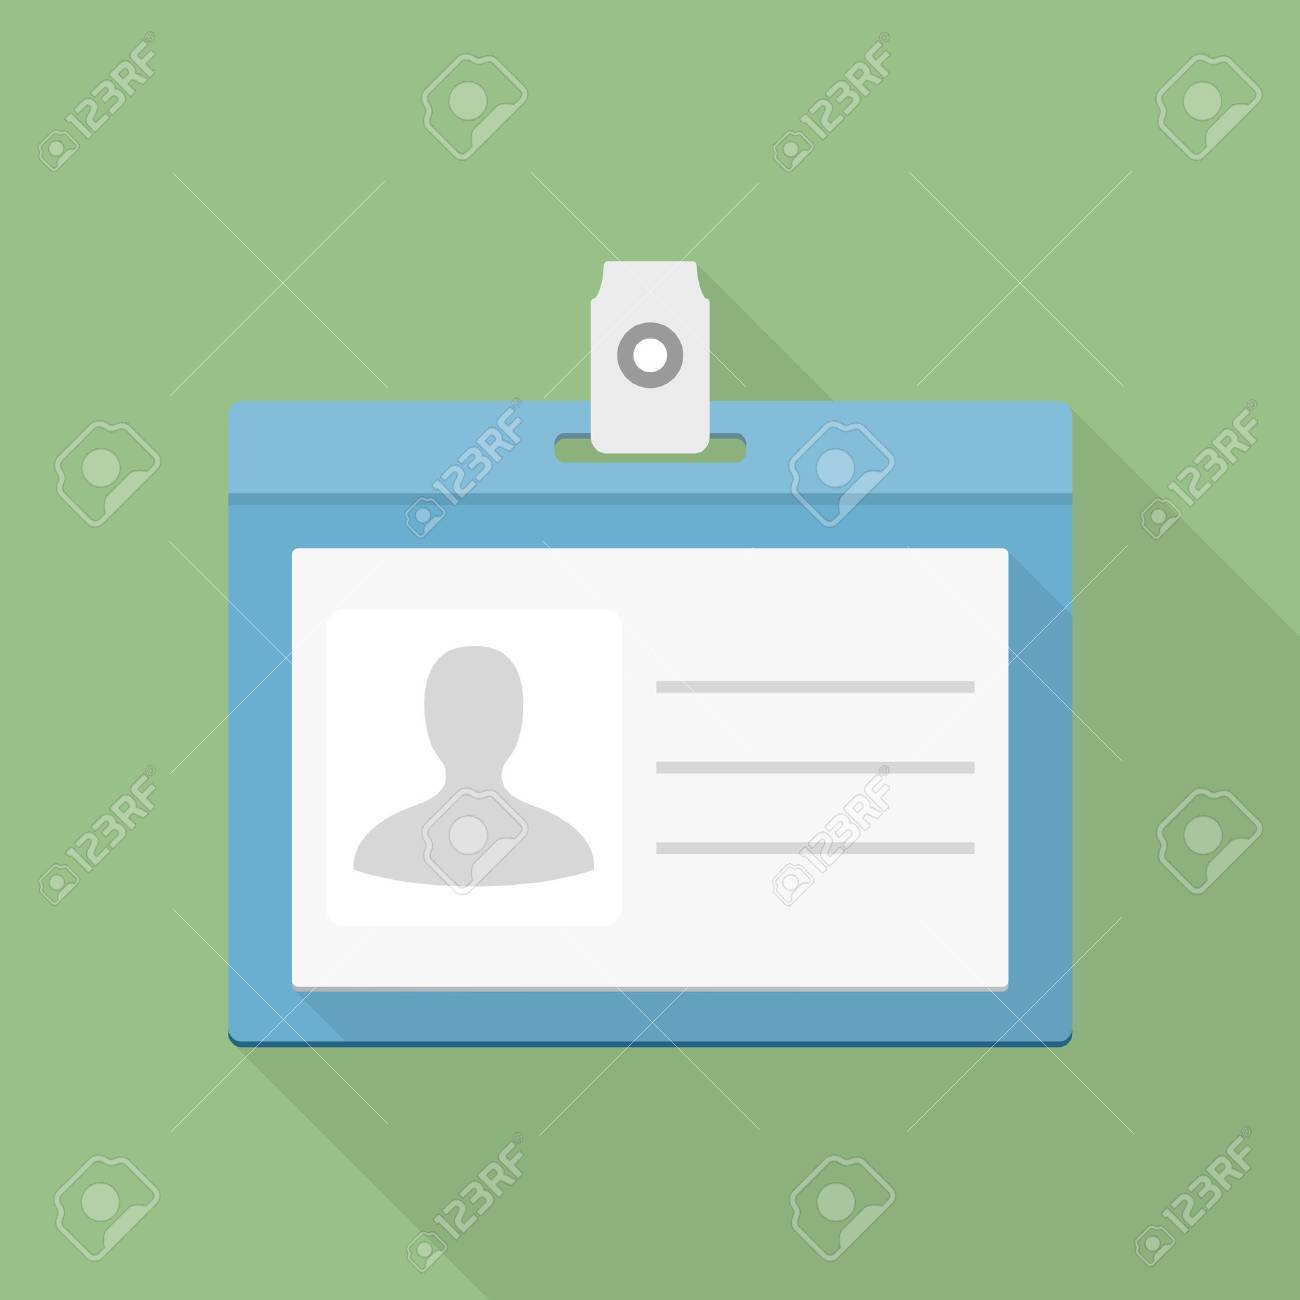 Identification card icon, flat design - 46346124